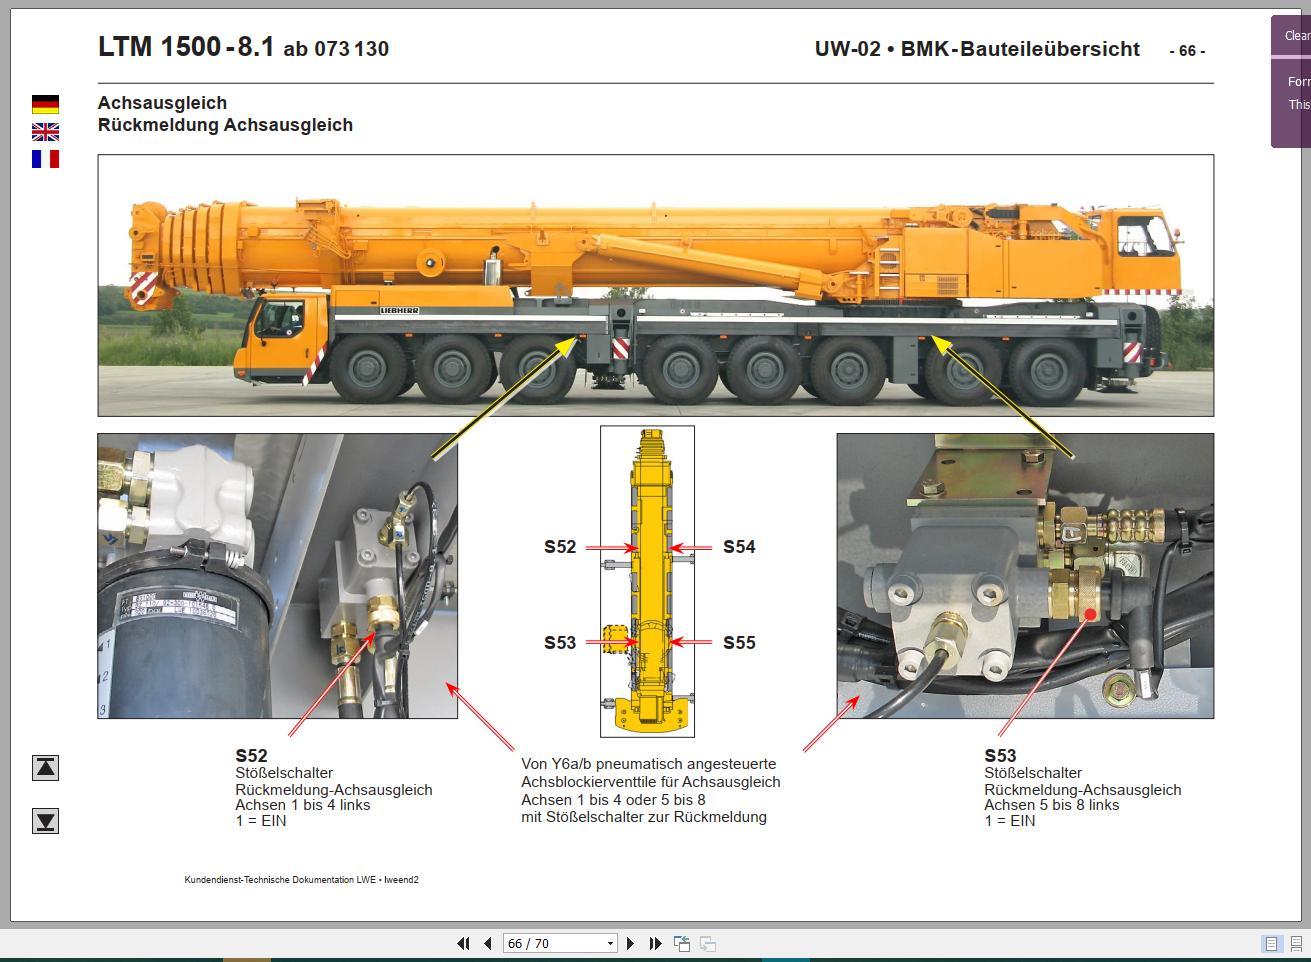 liebherr mobile and crawler crane full model dvd auto